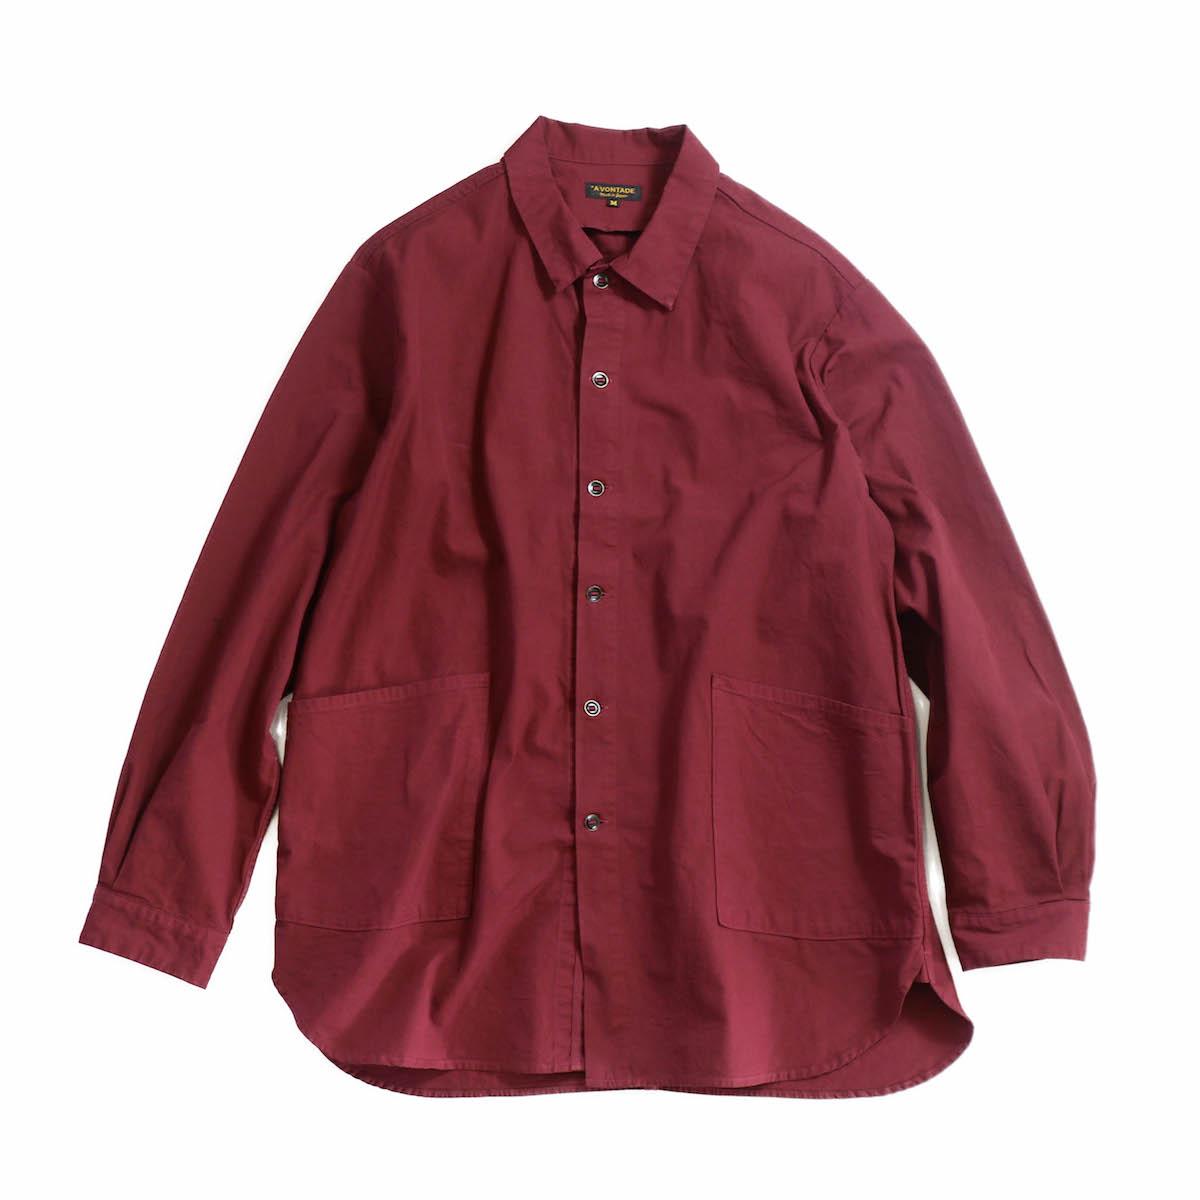 A VONTADE / Gardener Shirt Jacket -BORDEAUX